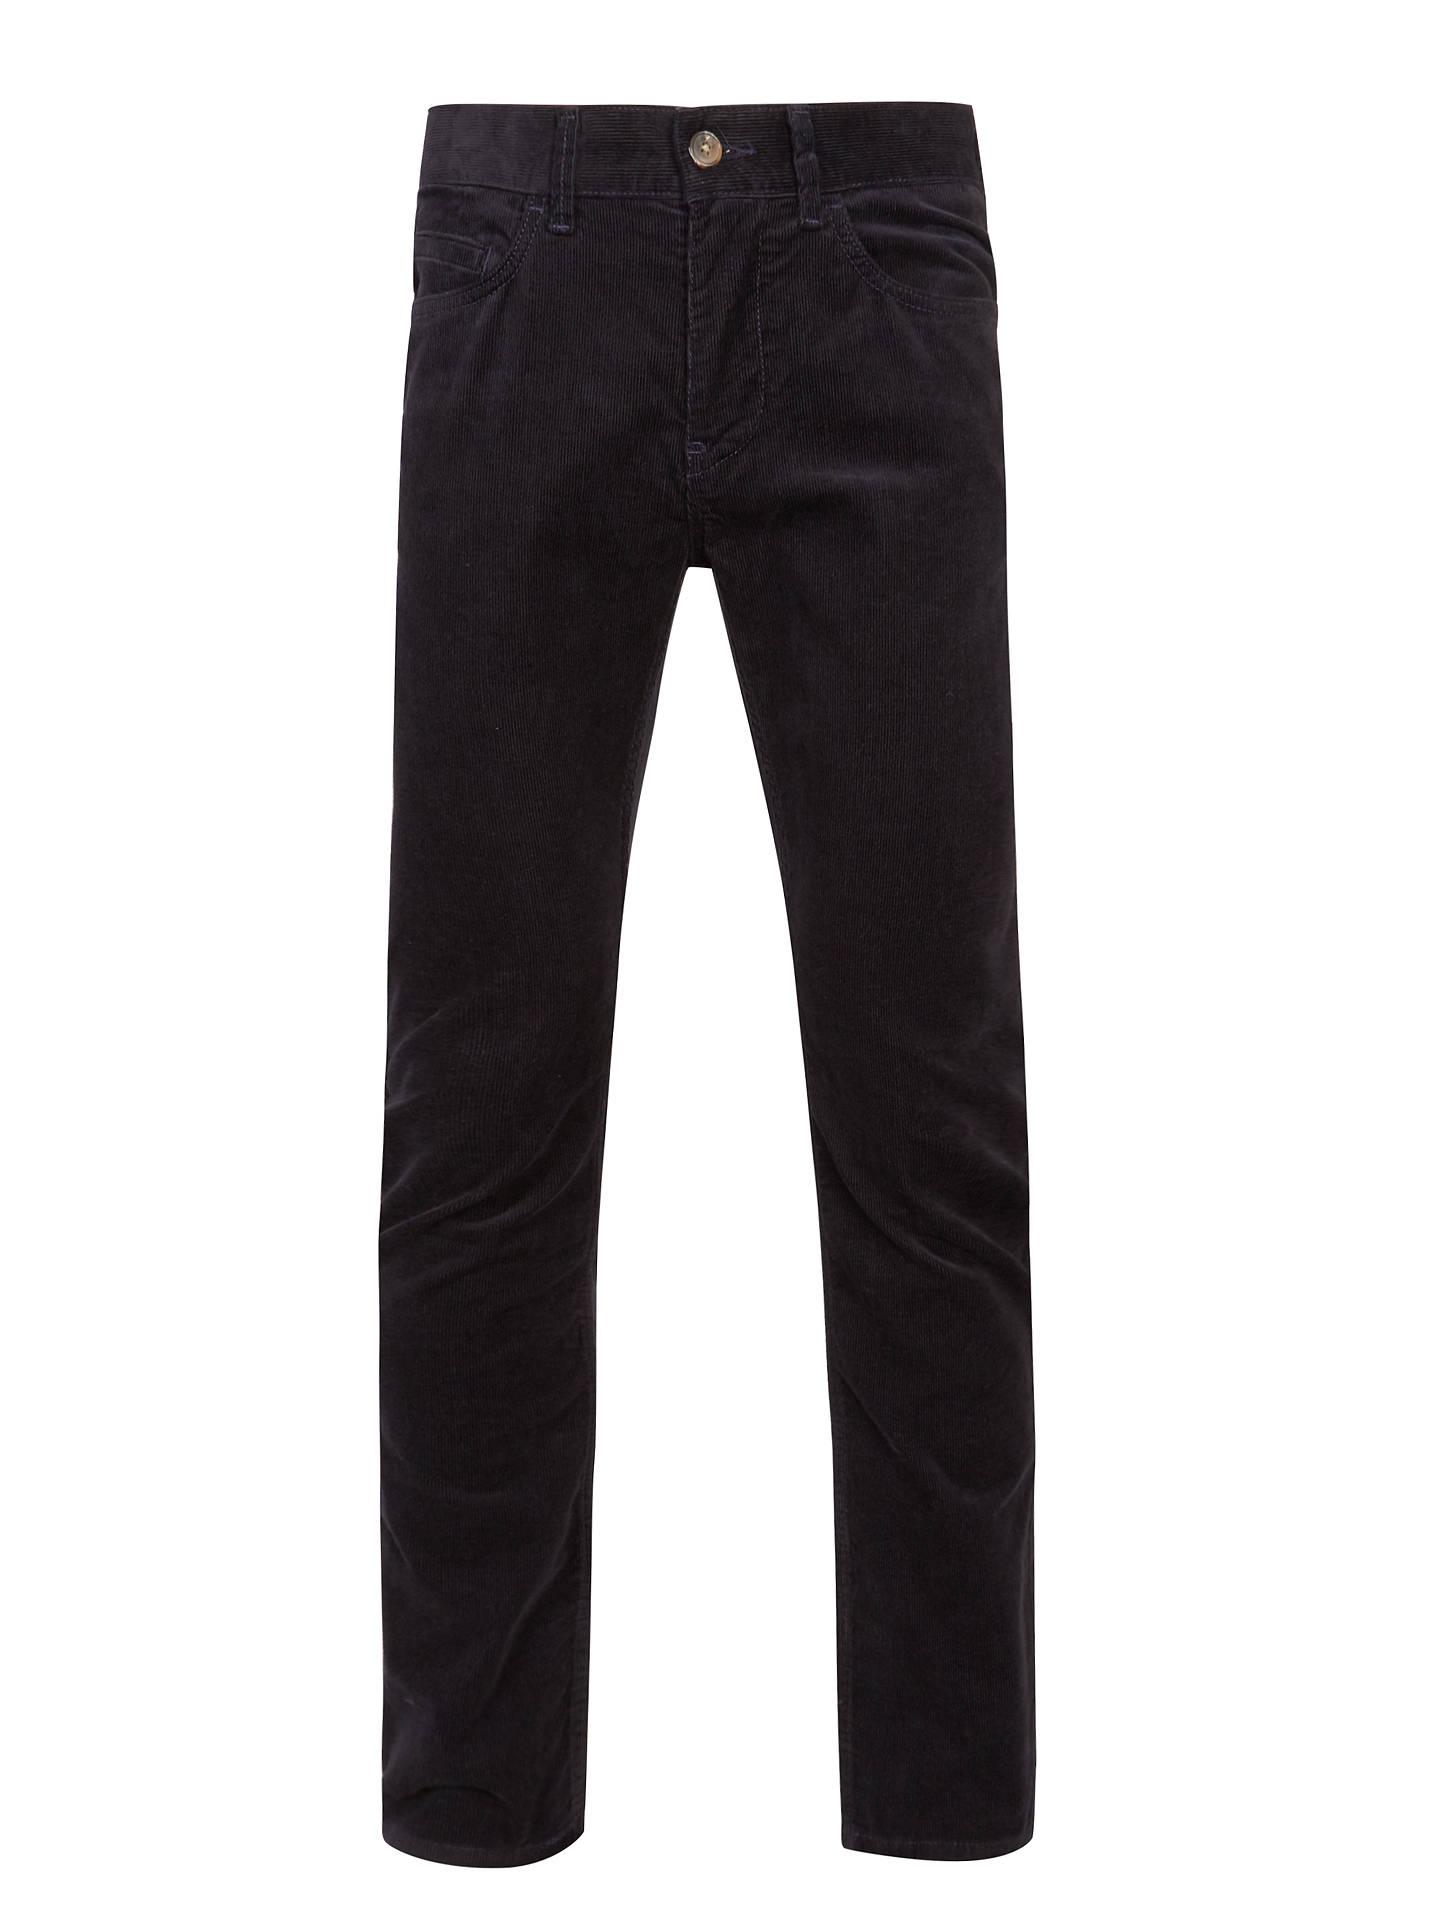 064cdcd792055 Buy Tommy Hilfiger Mercer Stretch Corduroy Trousers, Navy Blazer, 32R  Online at johnlewis.